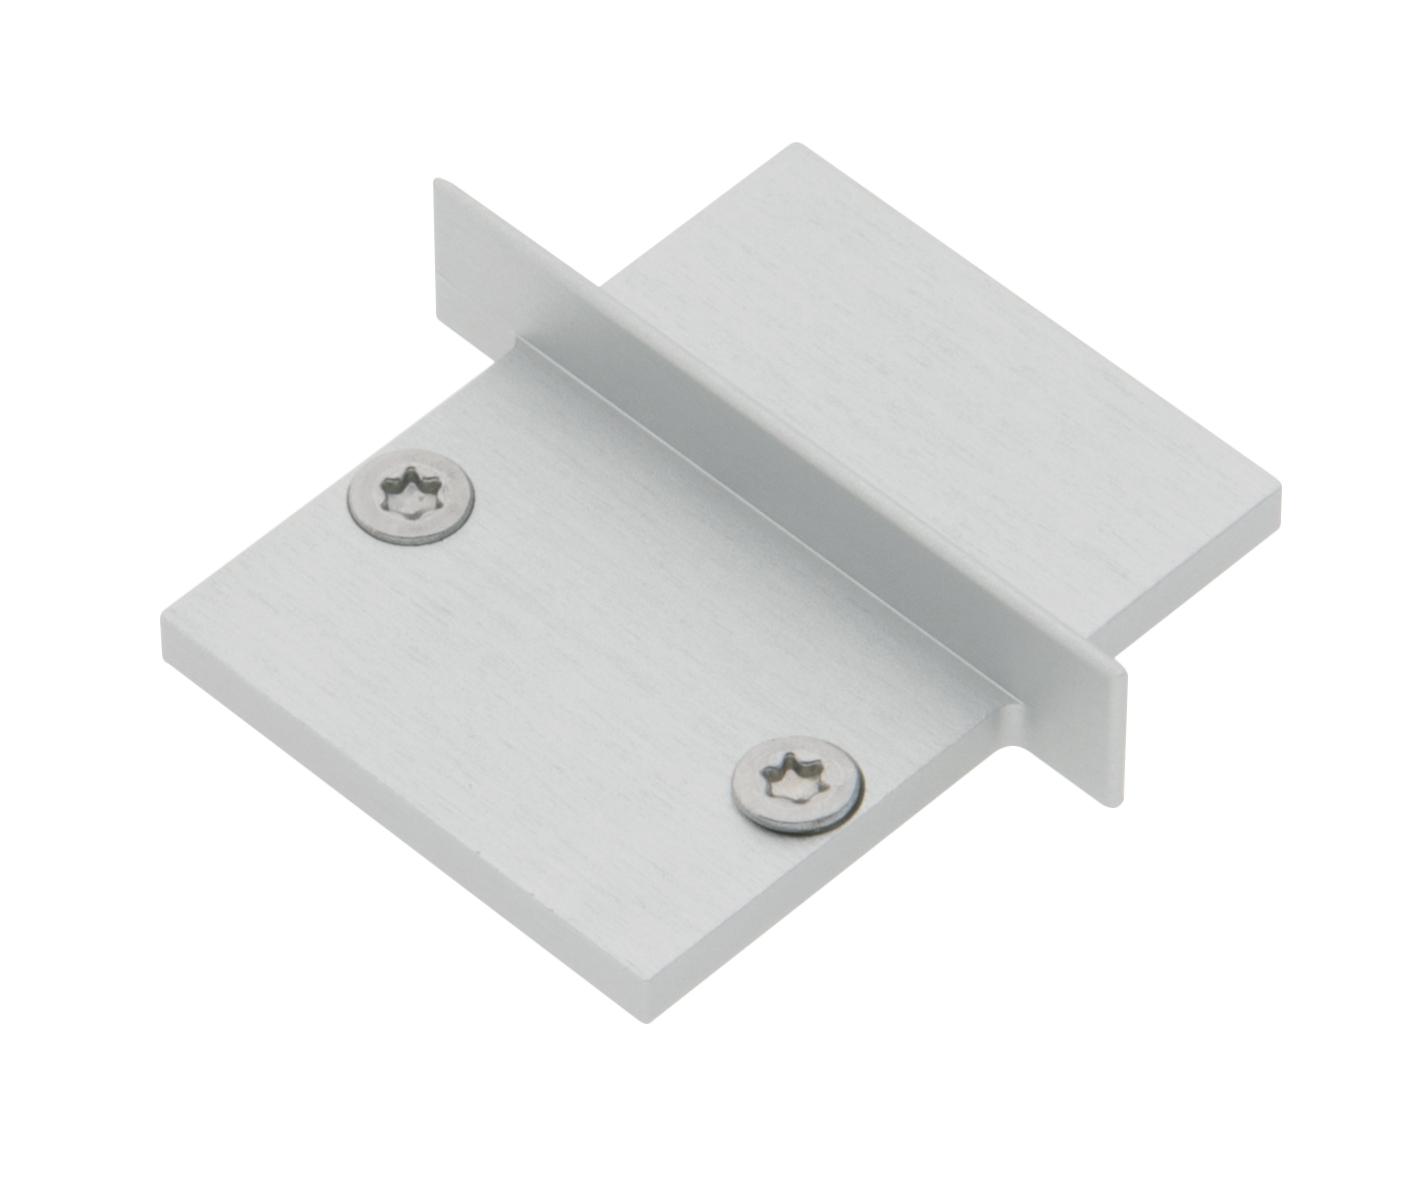 1 Stk Profil Endkappe TBJ Eckig geschlossen inkl. Schrauben LIEK002920